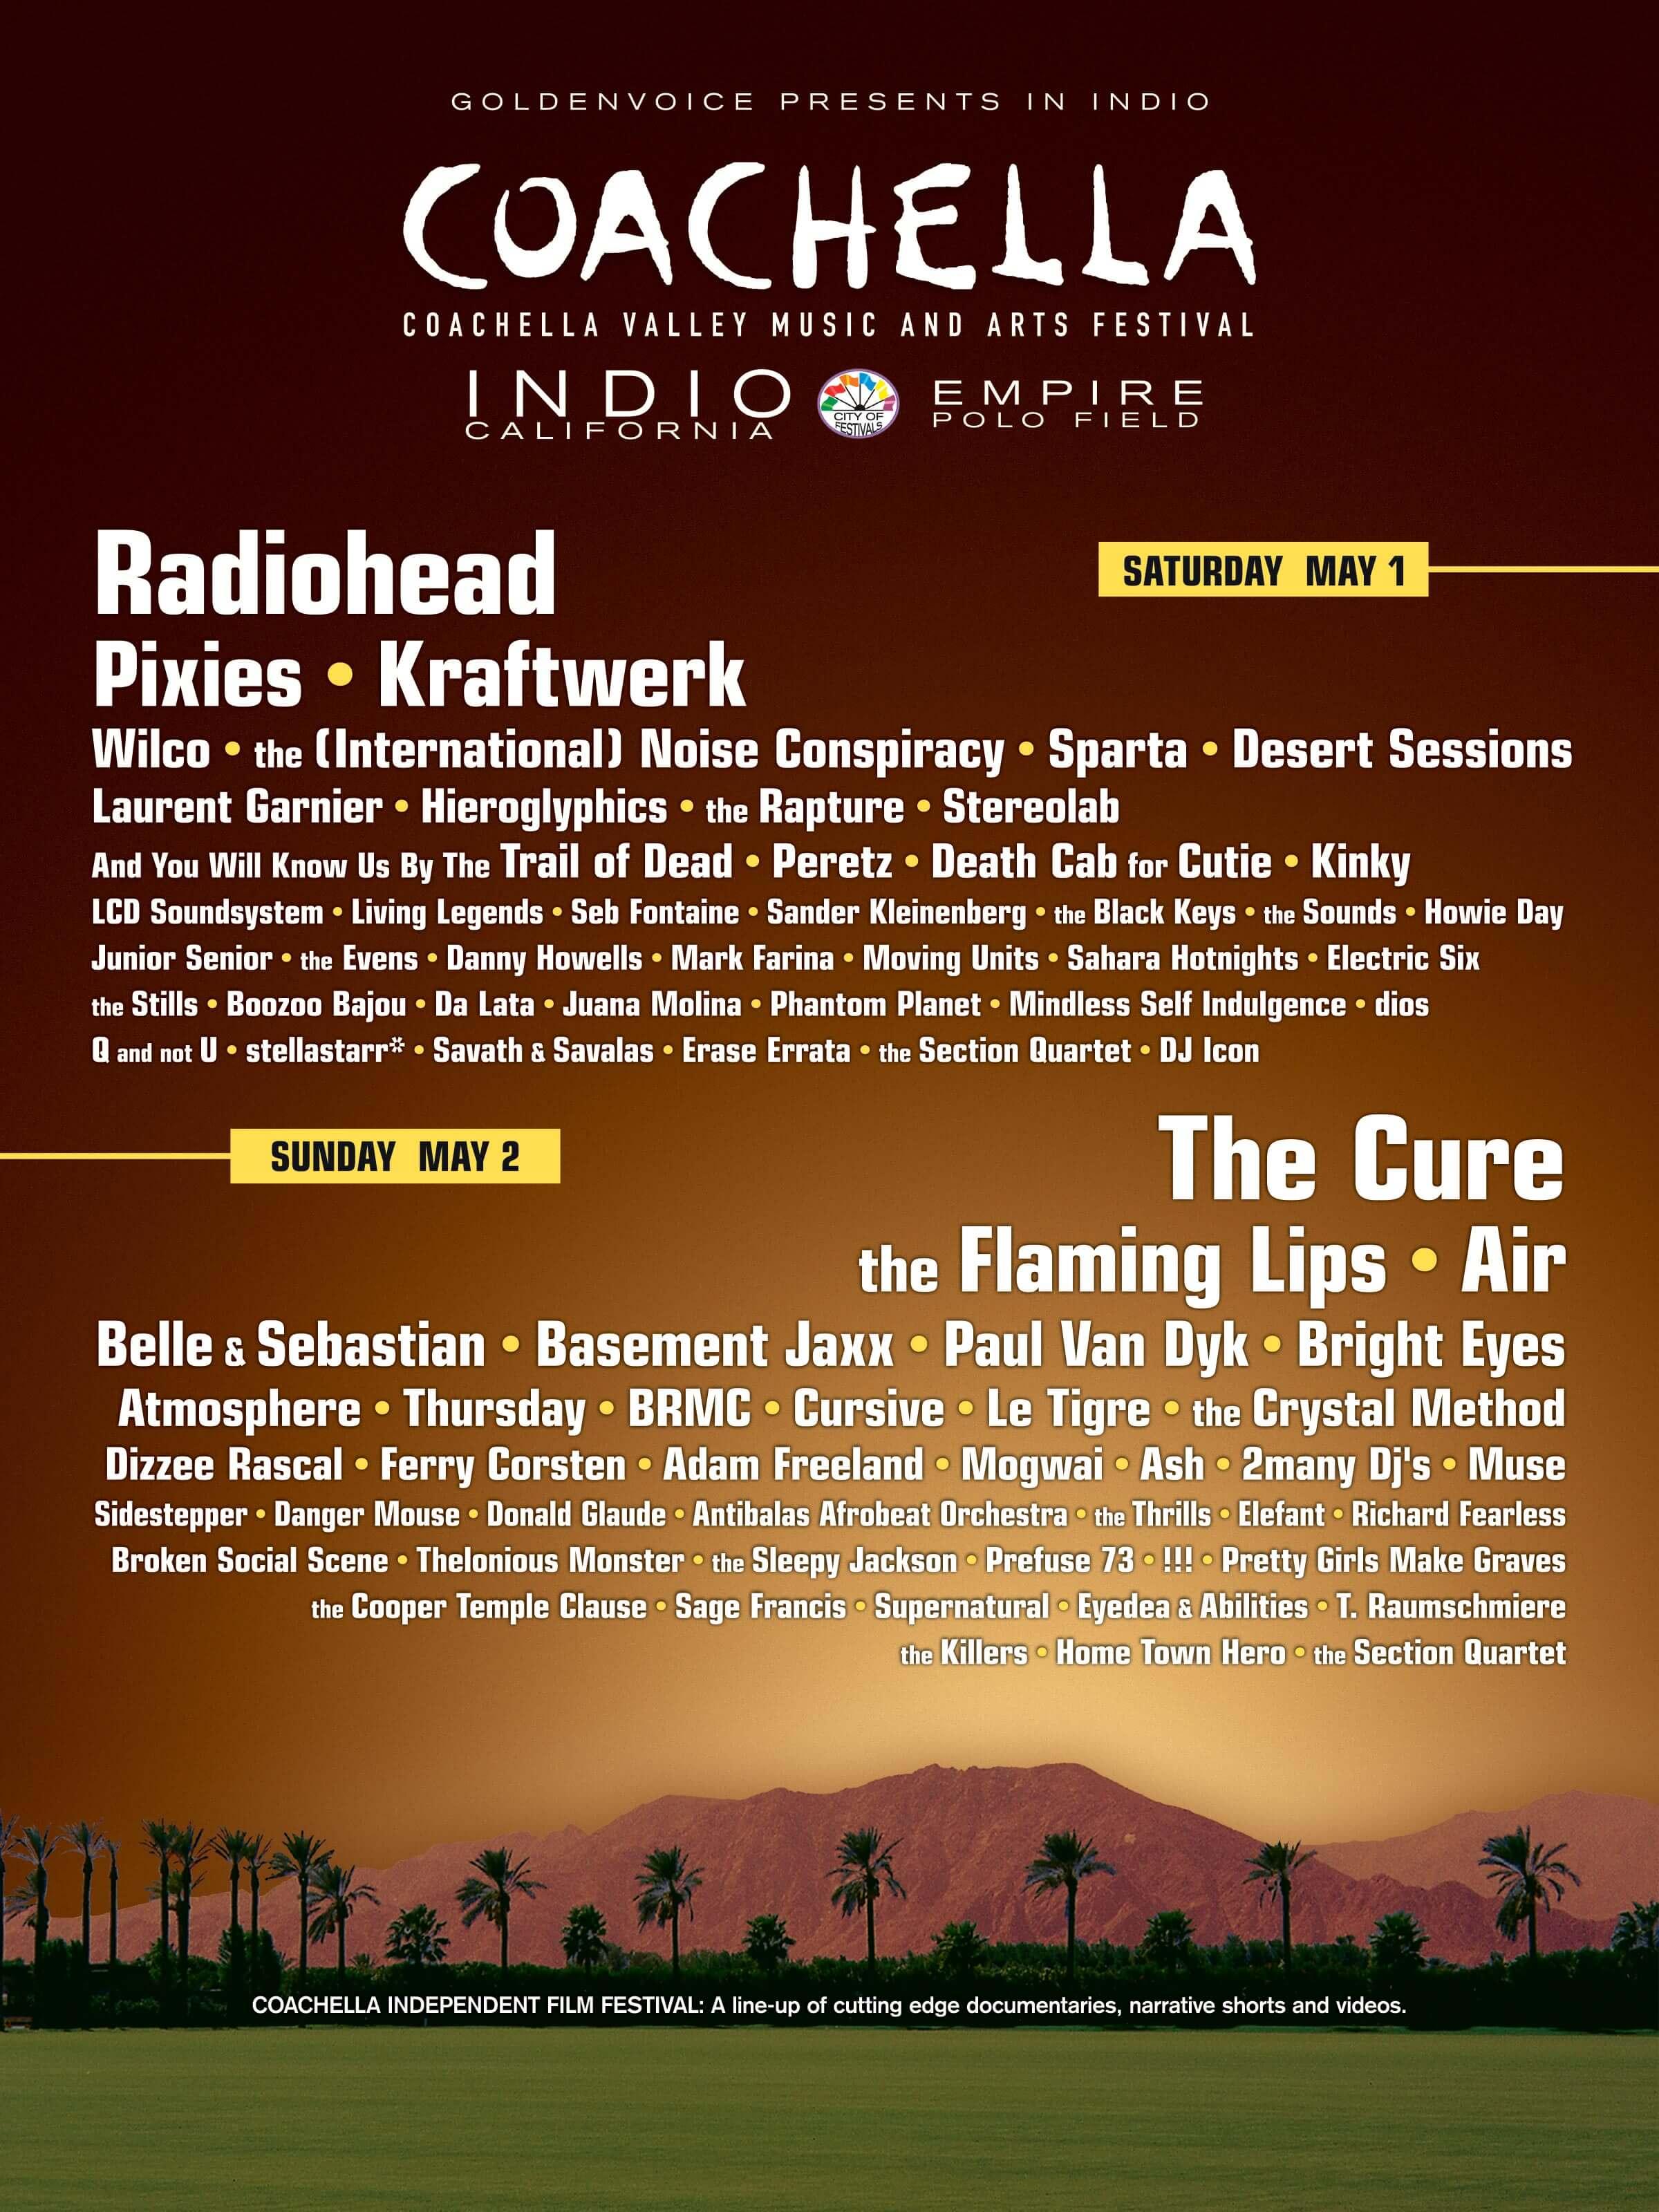 Coachella 2004 Lineup Poster